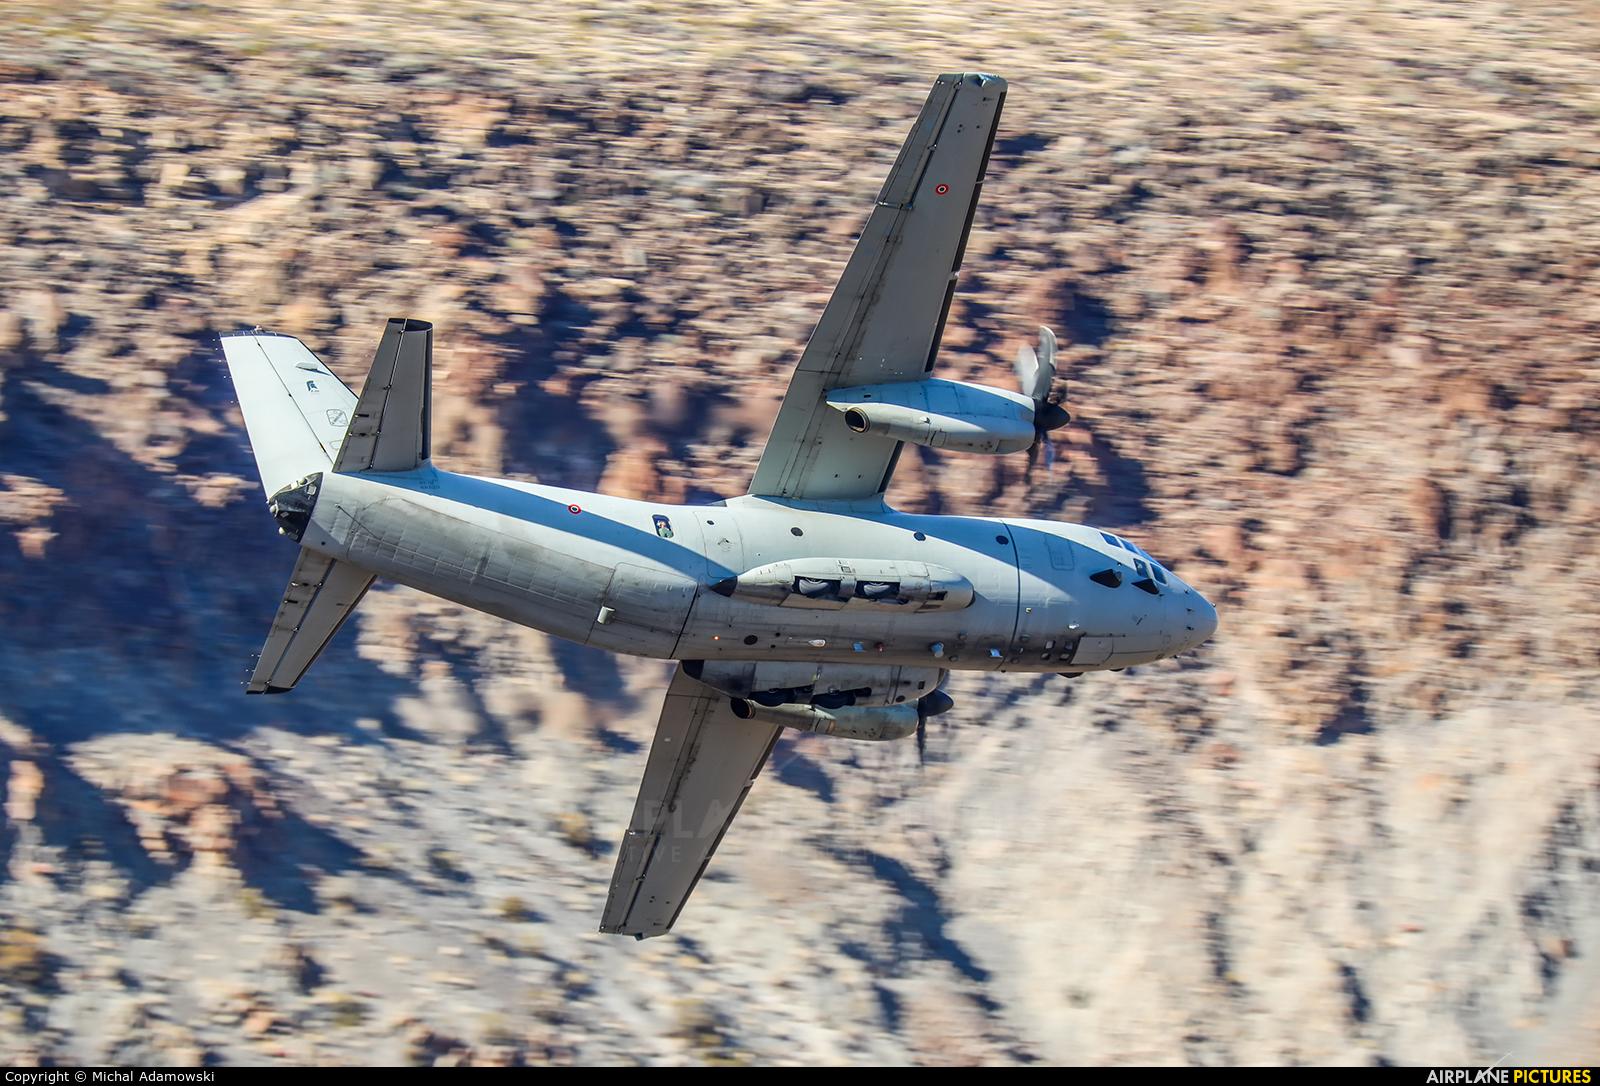 Italy - Air Force MM62223 aircraft at Rainbow Canyon - Off Airport